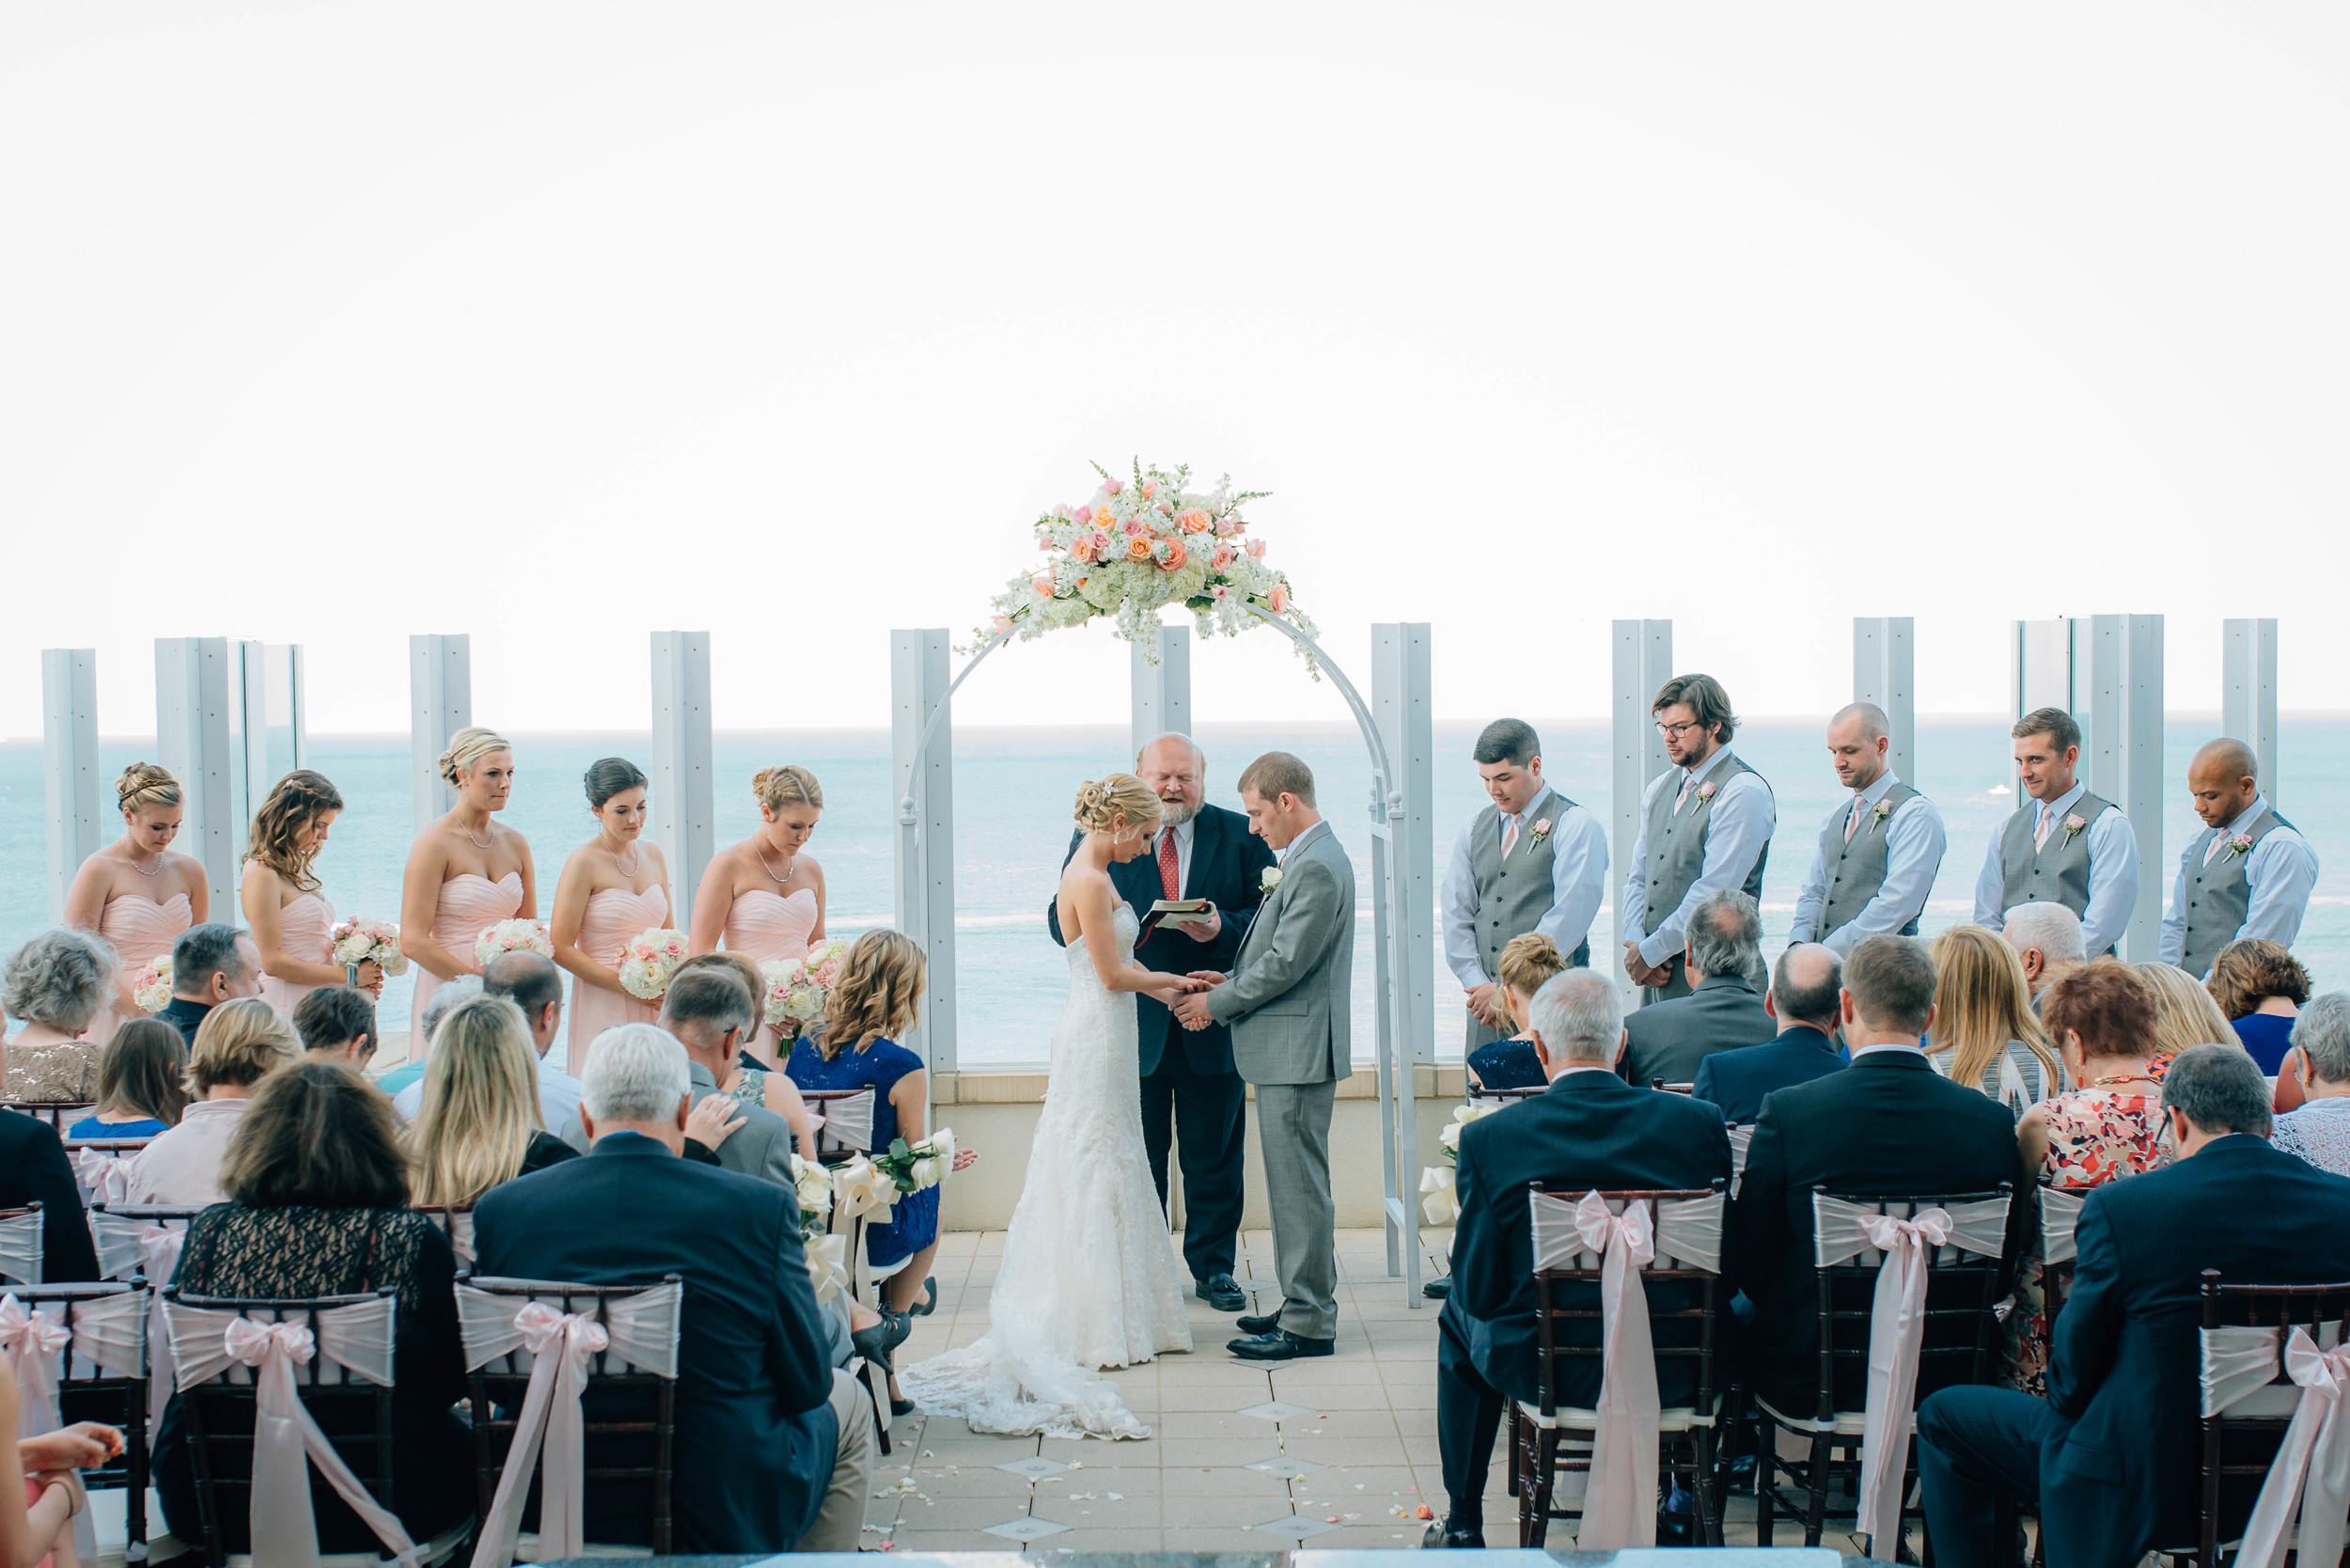 virginia-beach-wedding-photographer-norfolk-wedding-photographer-portsmouth-wedding-photographer-sandbridge-wedding-photographer-melissa-bliss-photography-oceanaire-resort-wedding